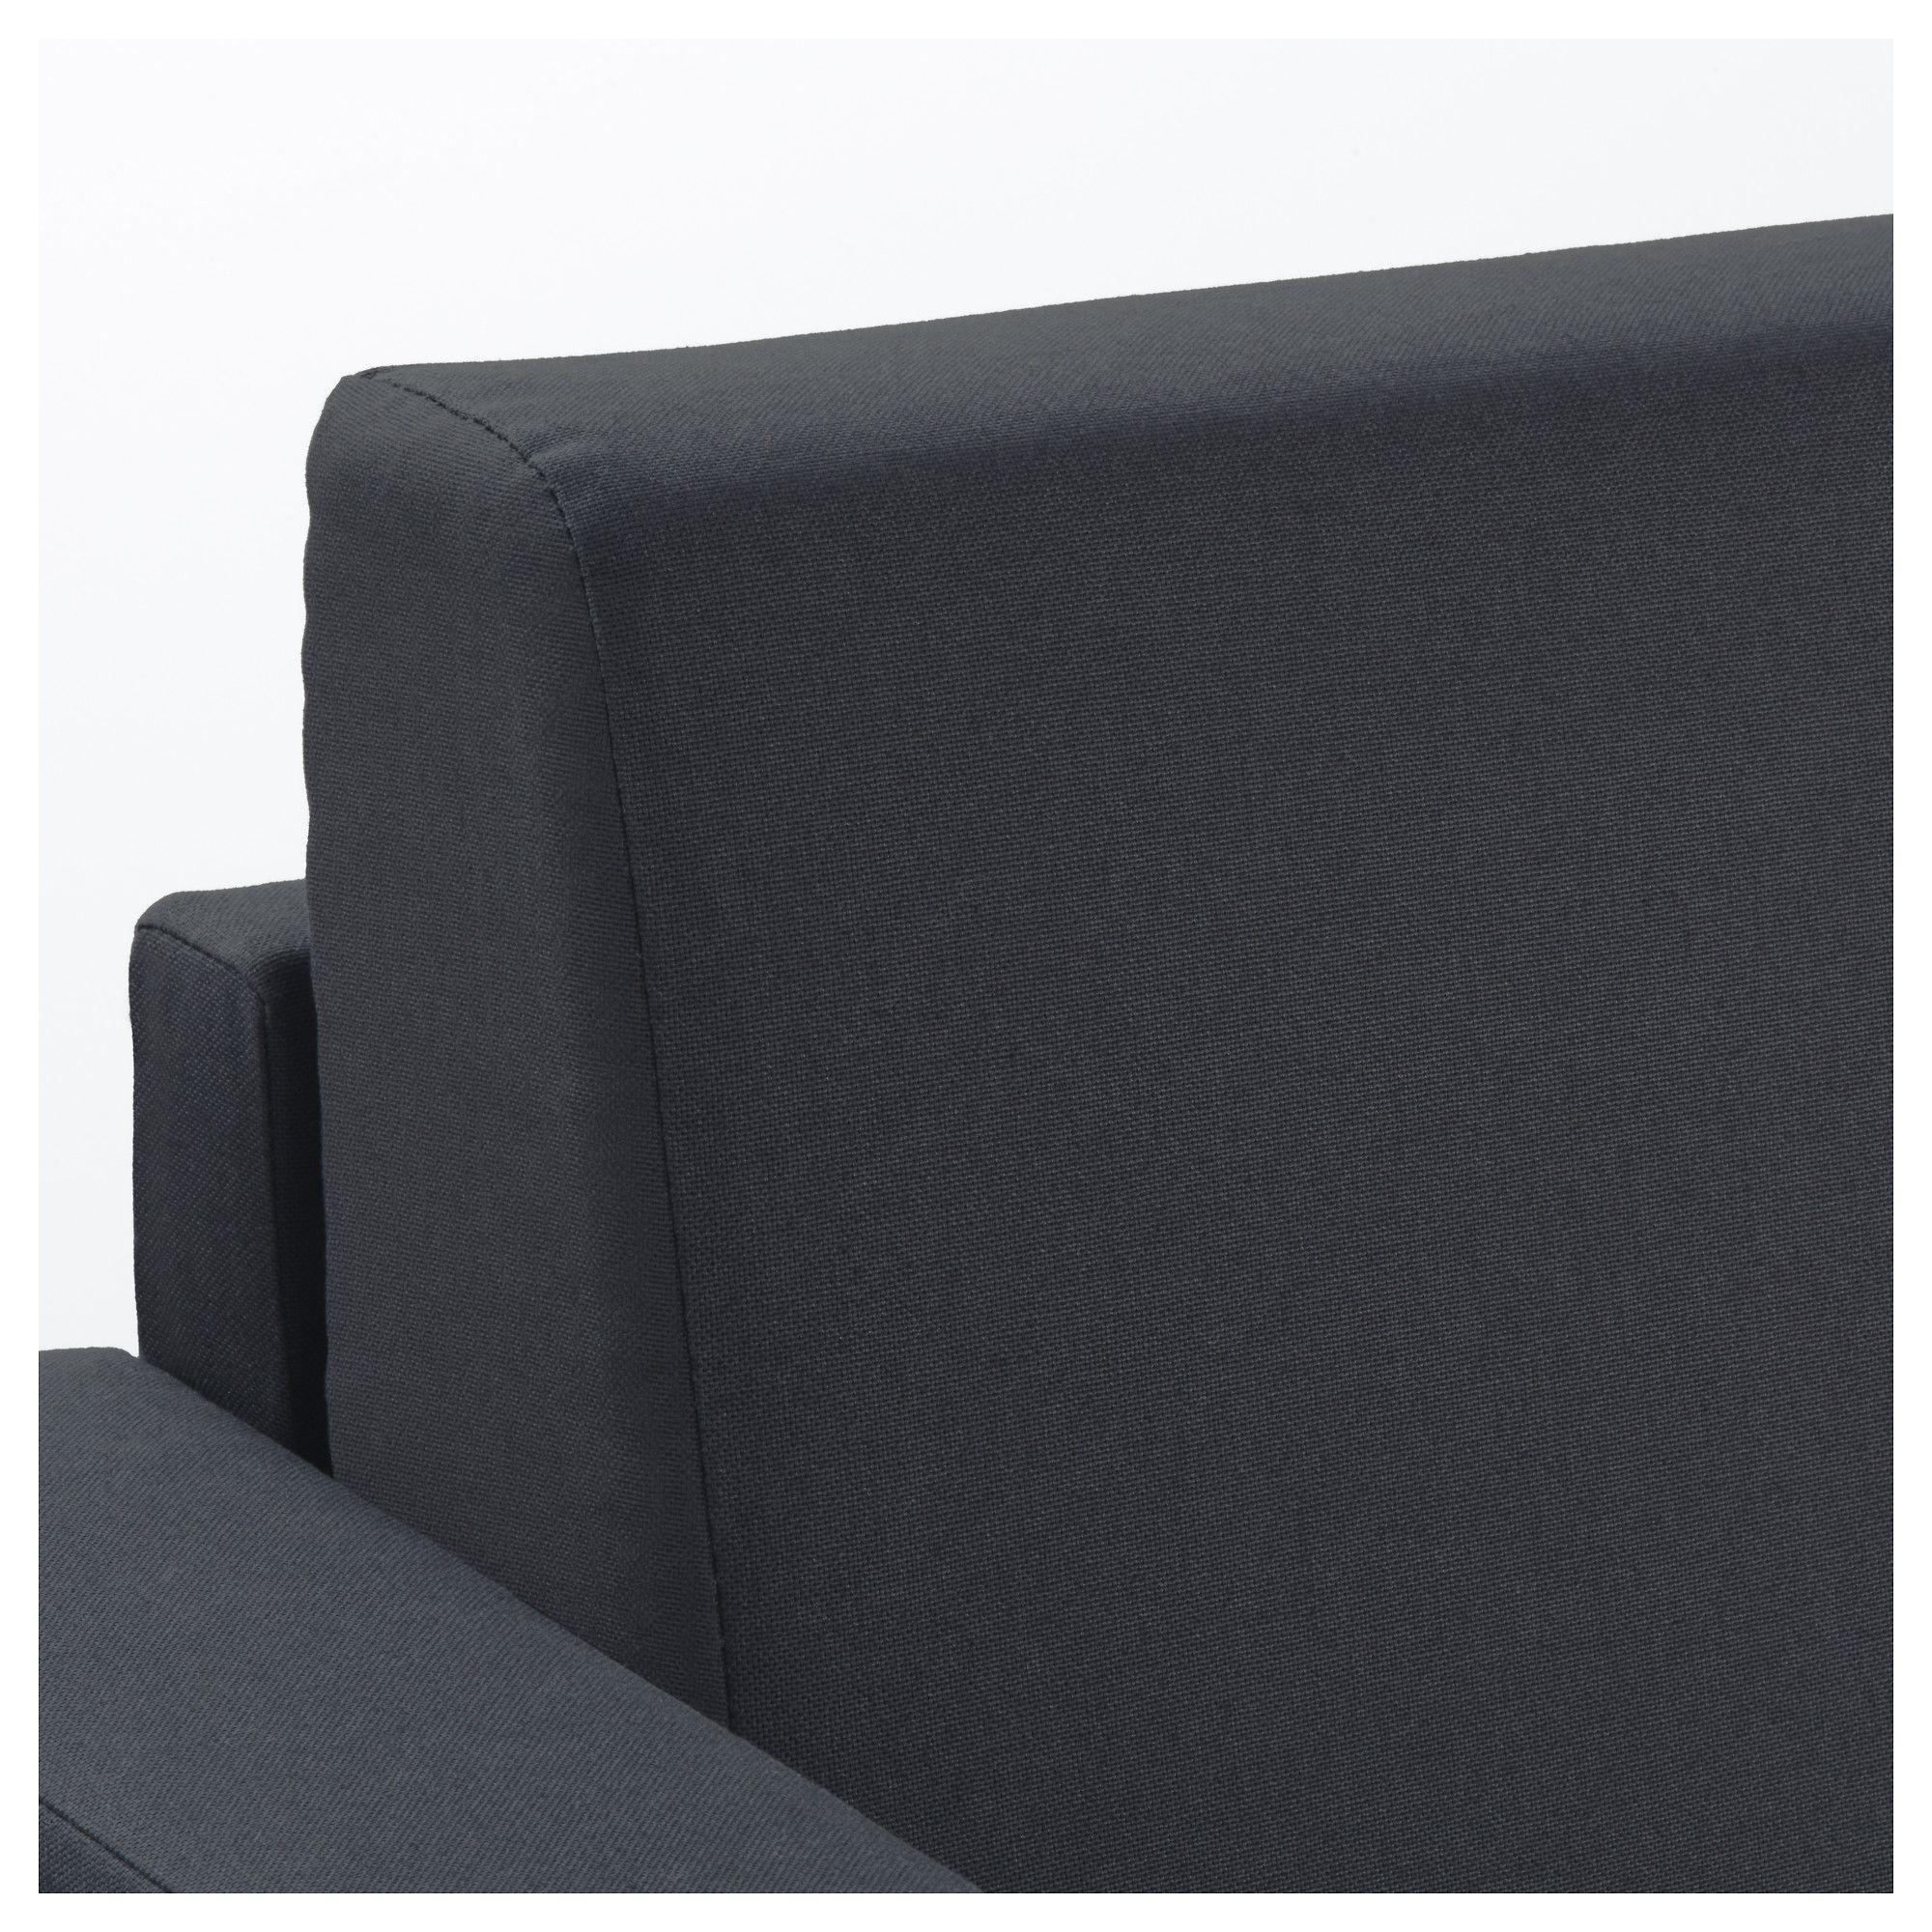 Ikea Ullvi Two Seat Sofa Bed Readily Converts Into A Bed Sofa  # Armoire Fin Depliable Cuisine Ikea